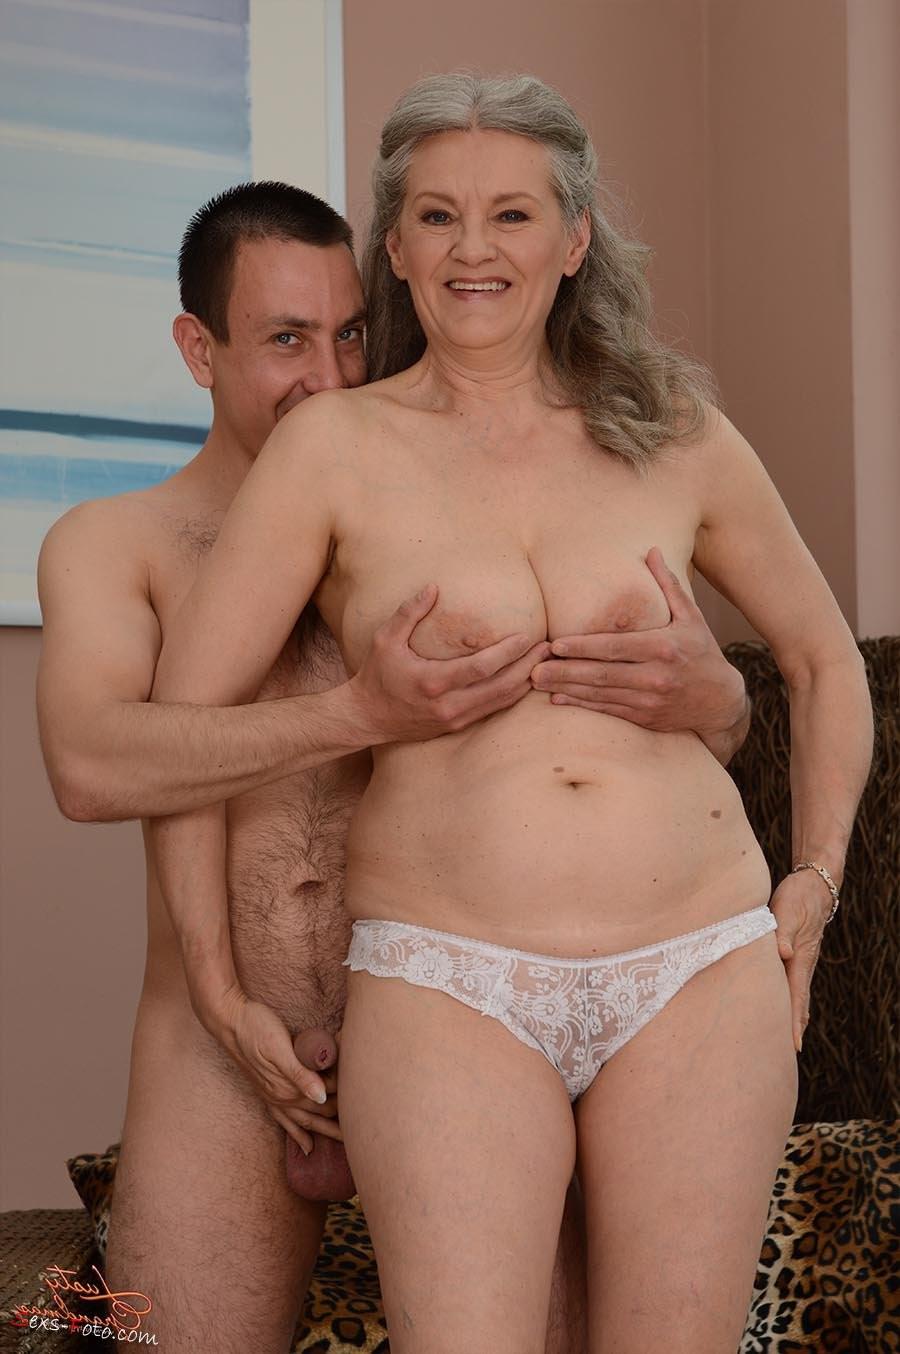 brasilien girls hd nude pic – Erotic